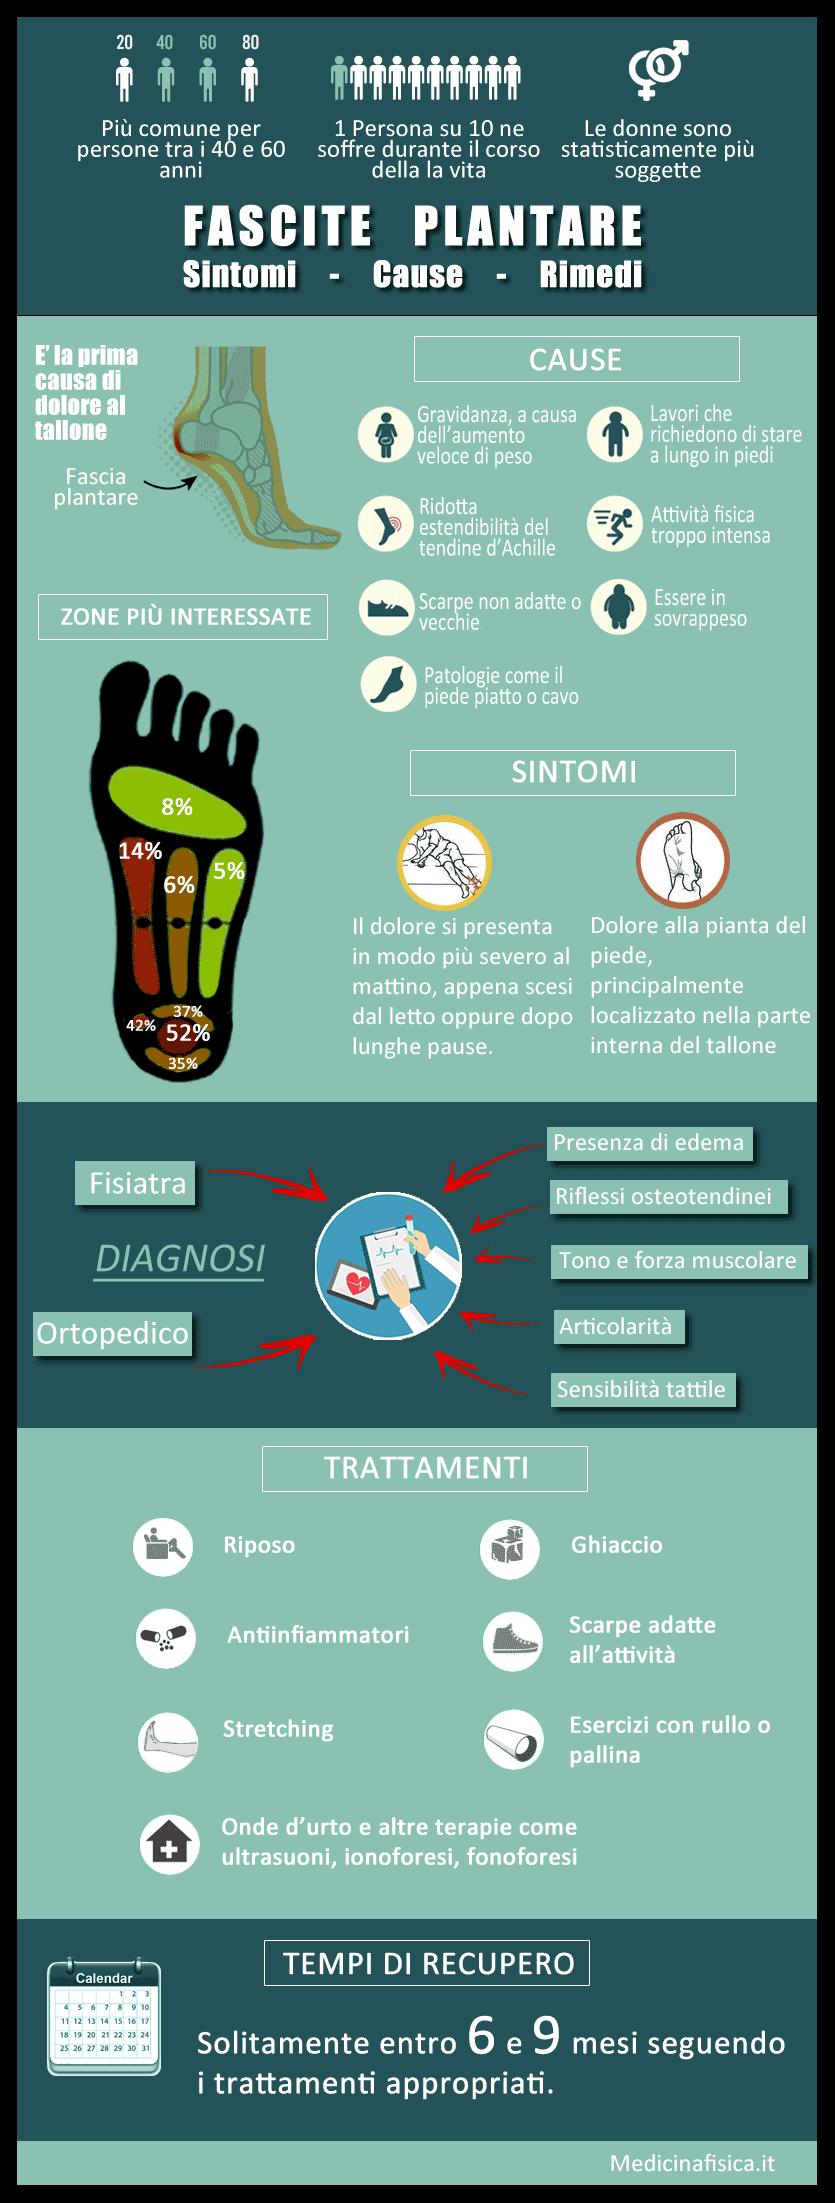 Infografica fascite plantare